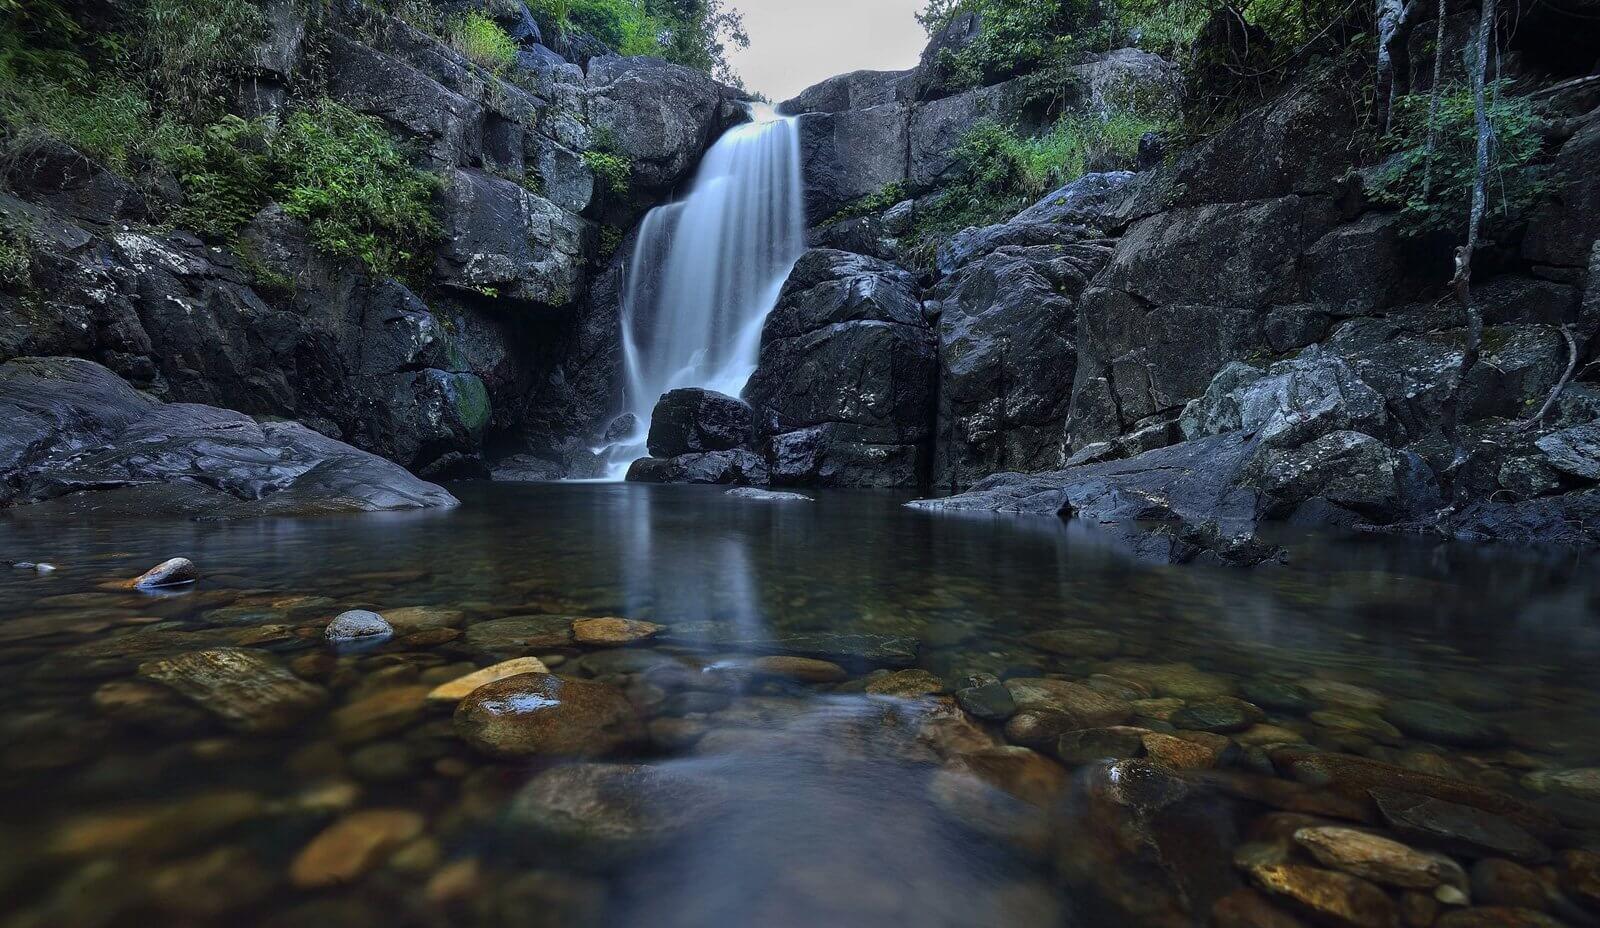 Talakona Waterfalls